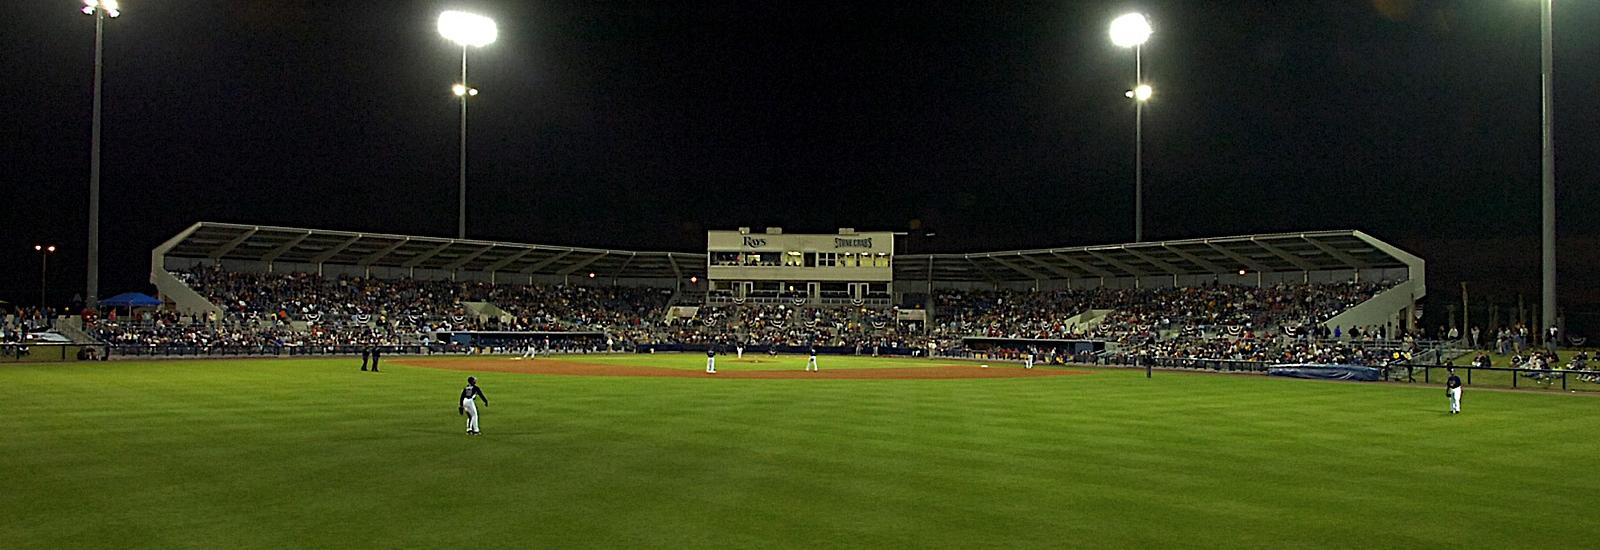 Charlotte Sports Park:  MLB Rays Spring Training & Charlotte Stone Crabs